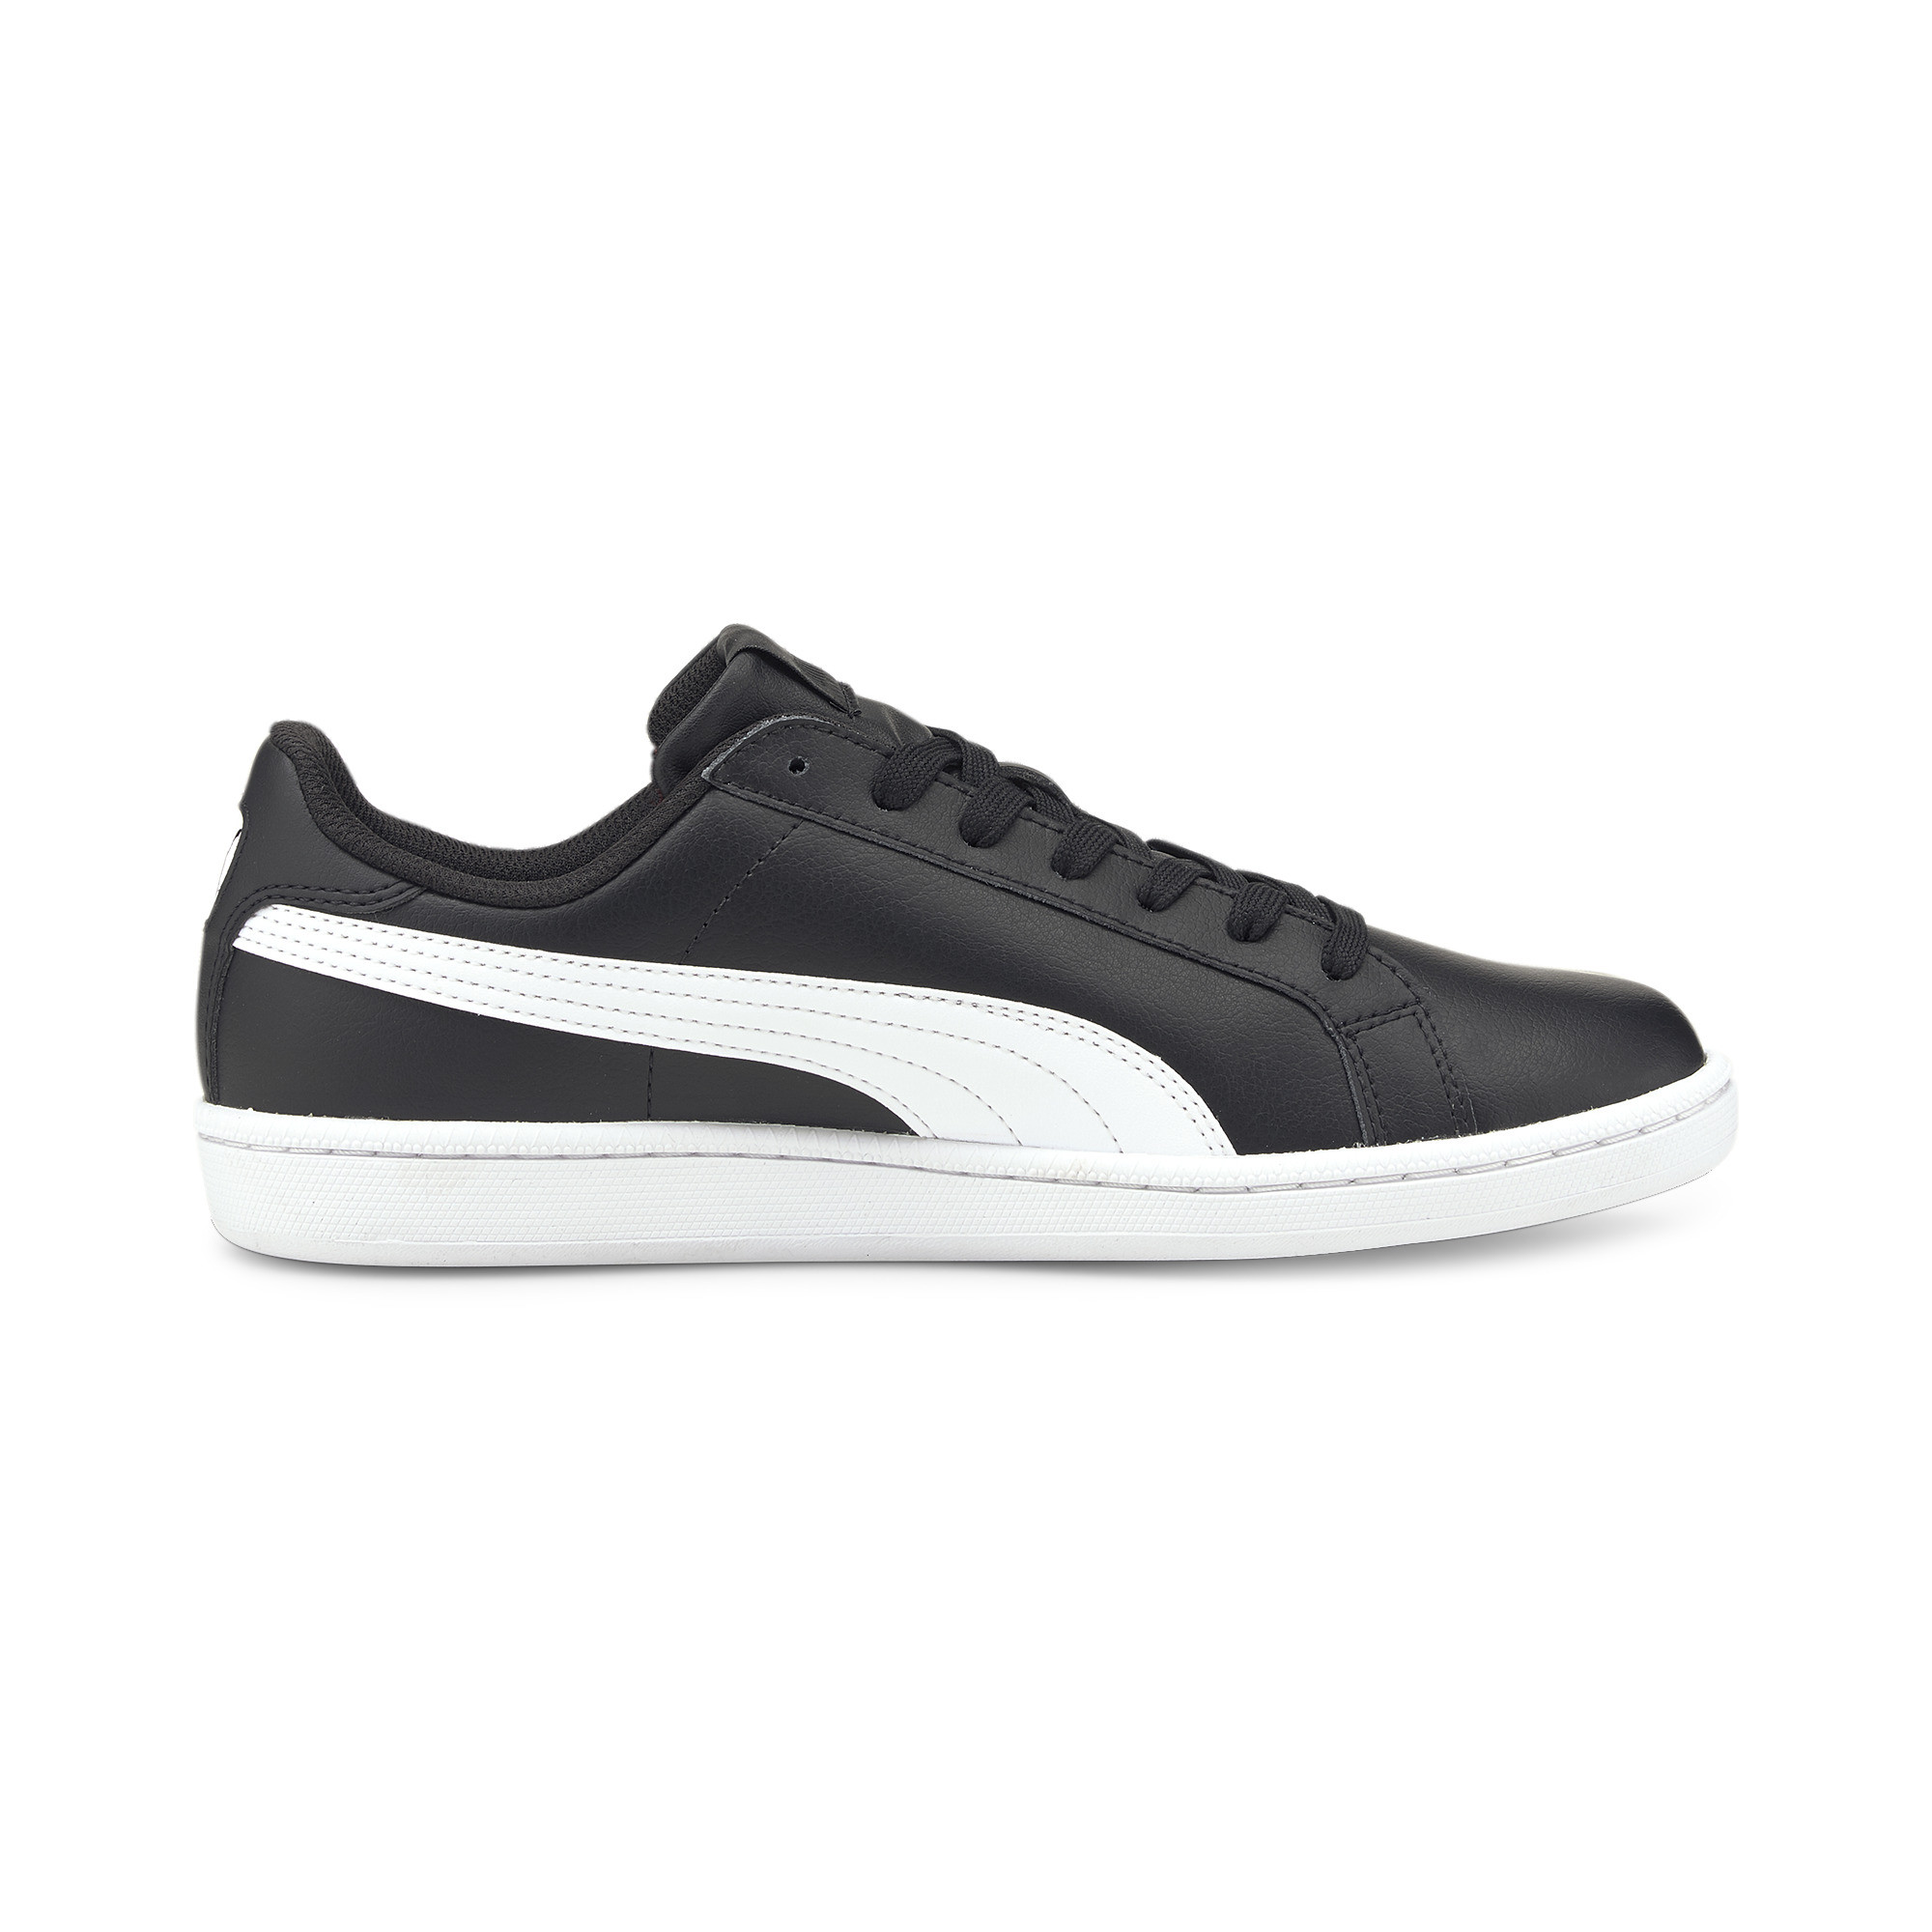 Indexbild 26 - PUMA Smash Trainers Schuhe Sneakers Sport Classics Unisex Neu